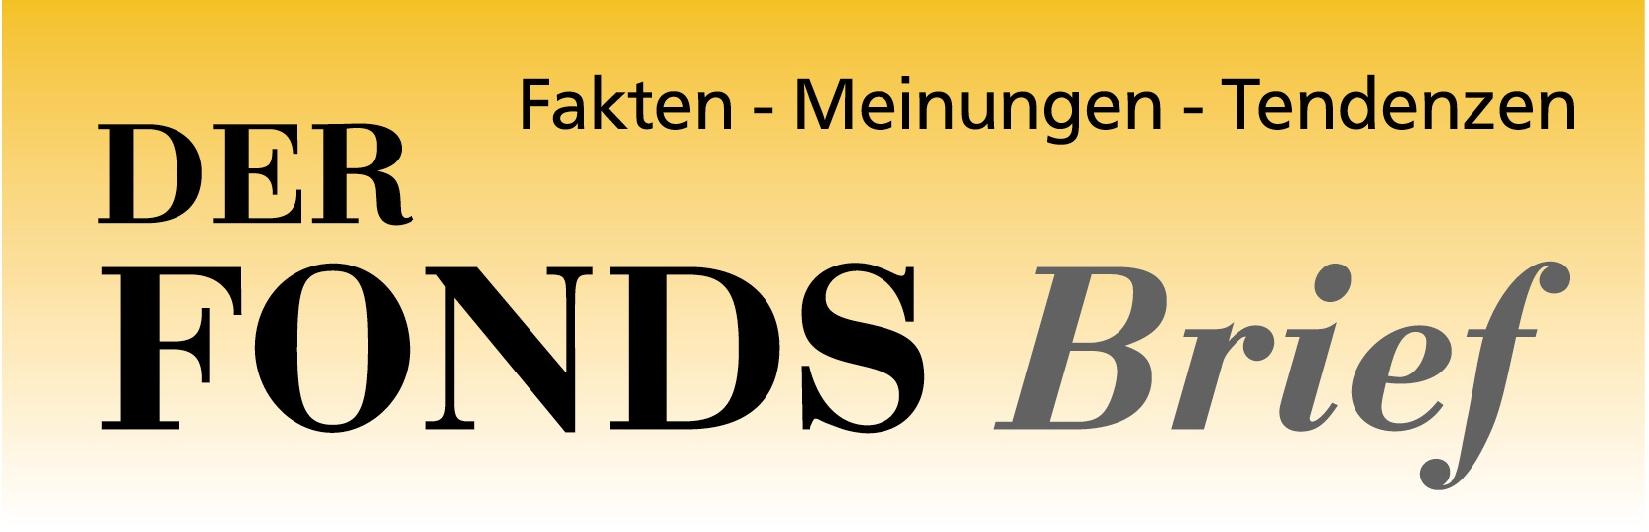 Logo Der Fondsbrief